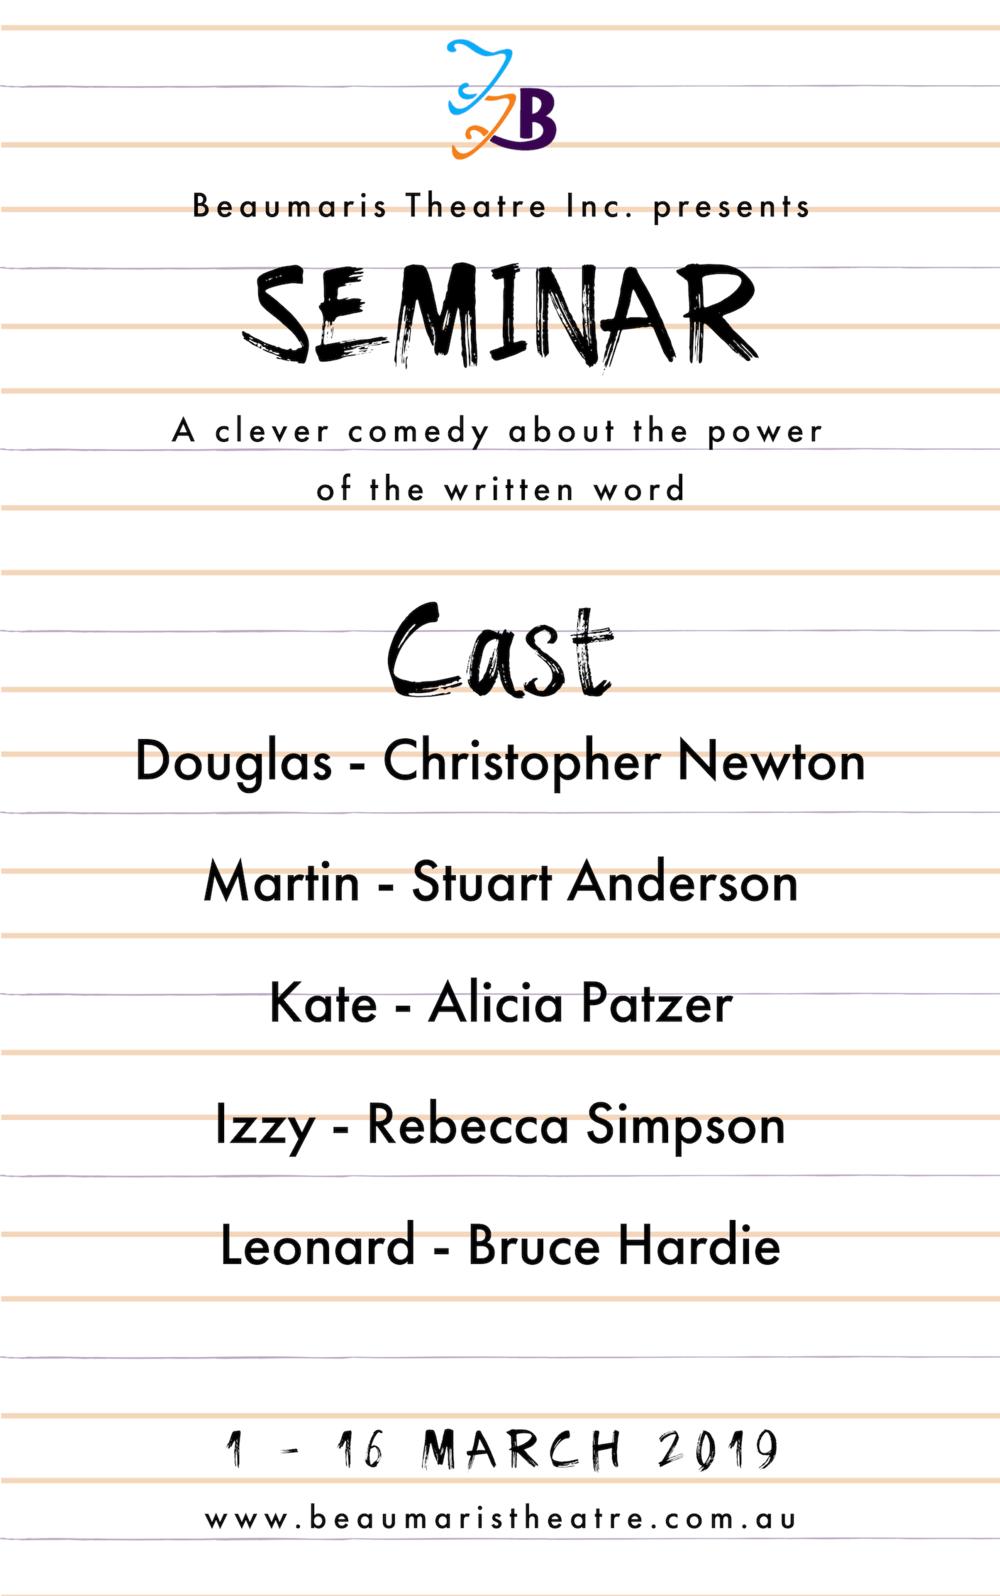 Seminar Cast Announcement 2.png